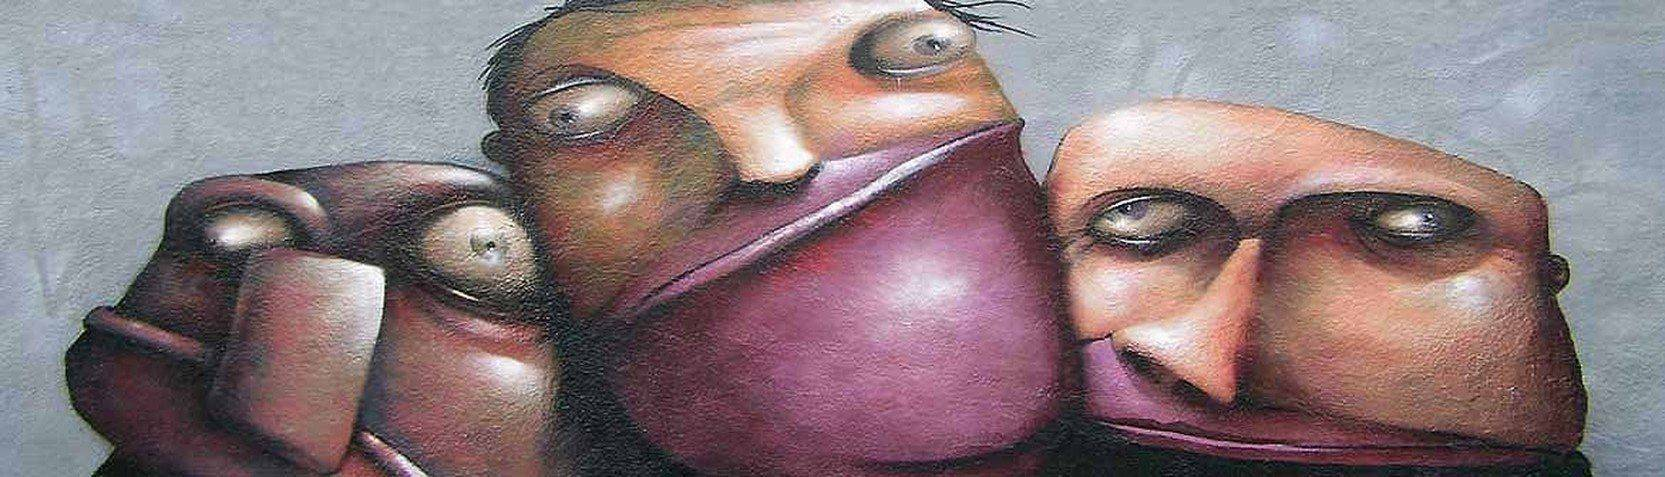 Art Styles - Graffiti & Streetart